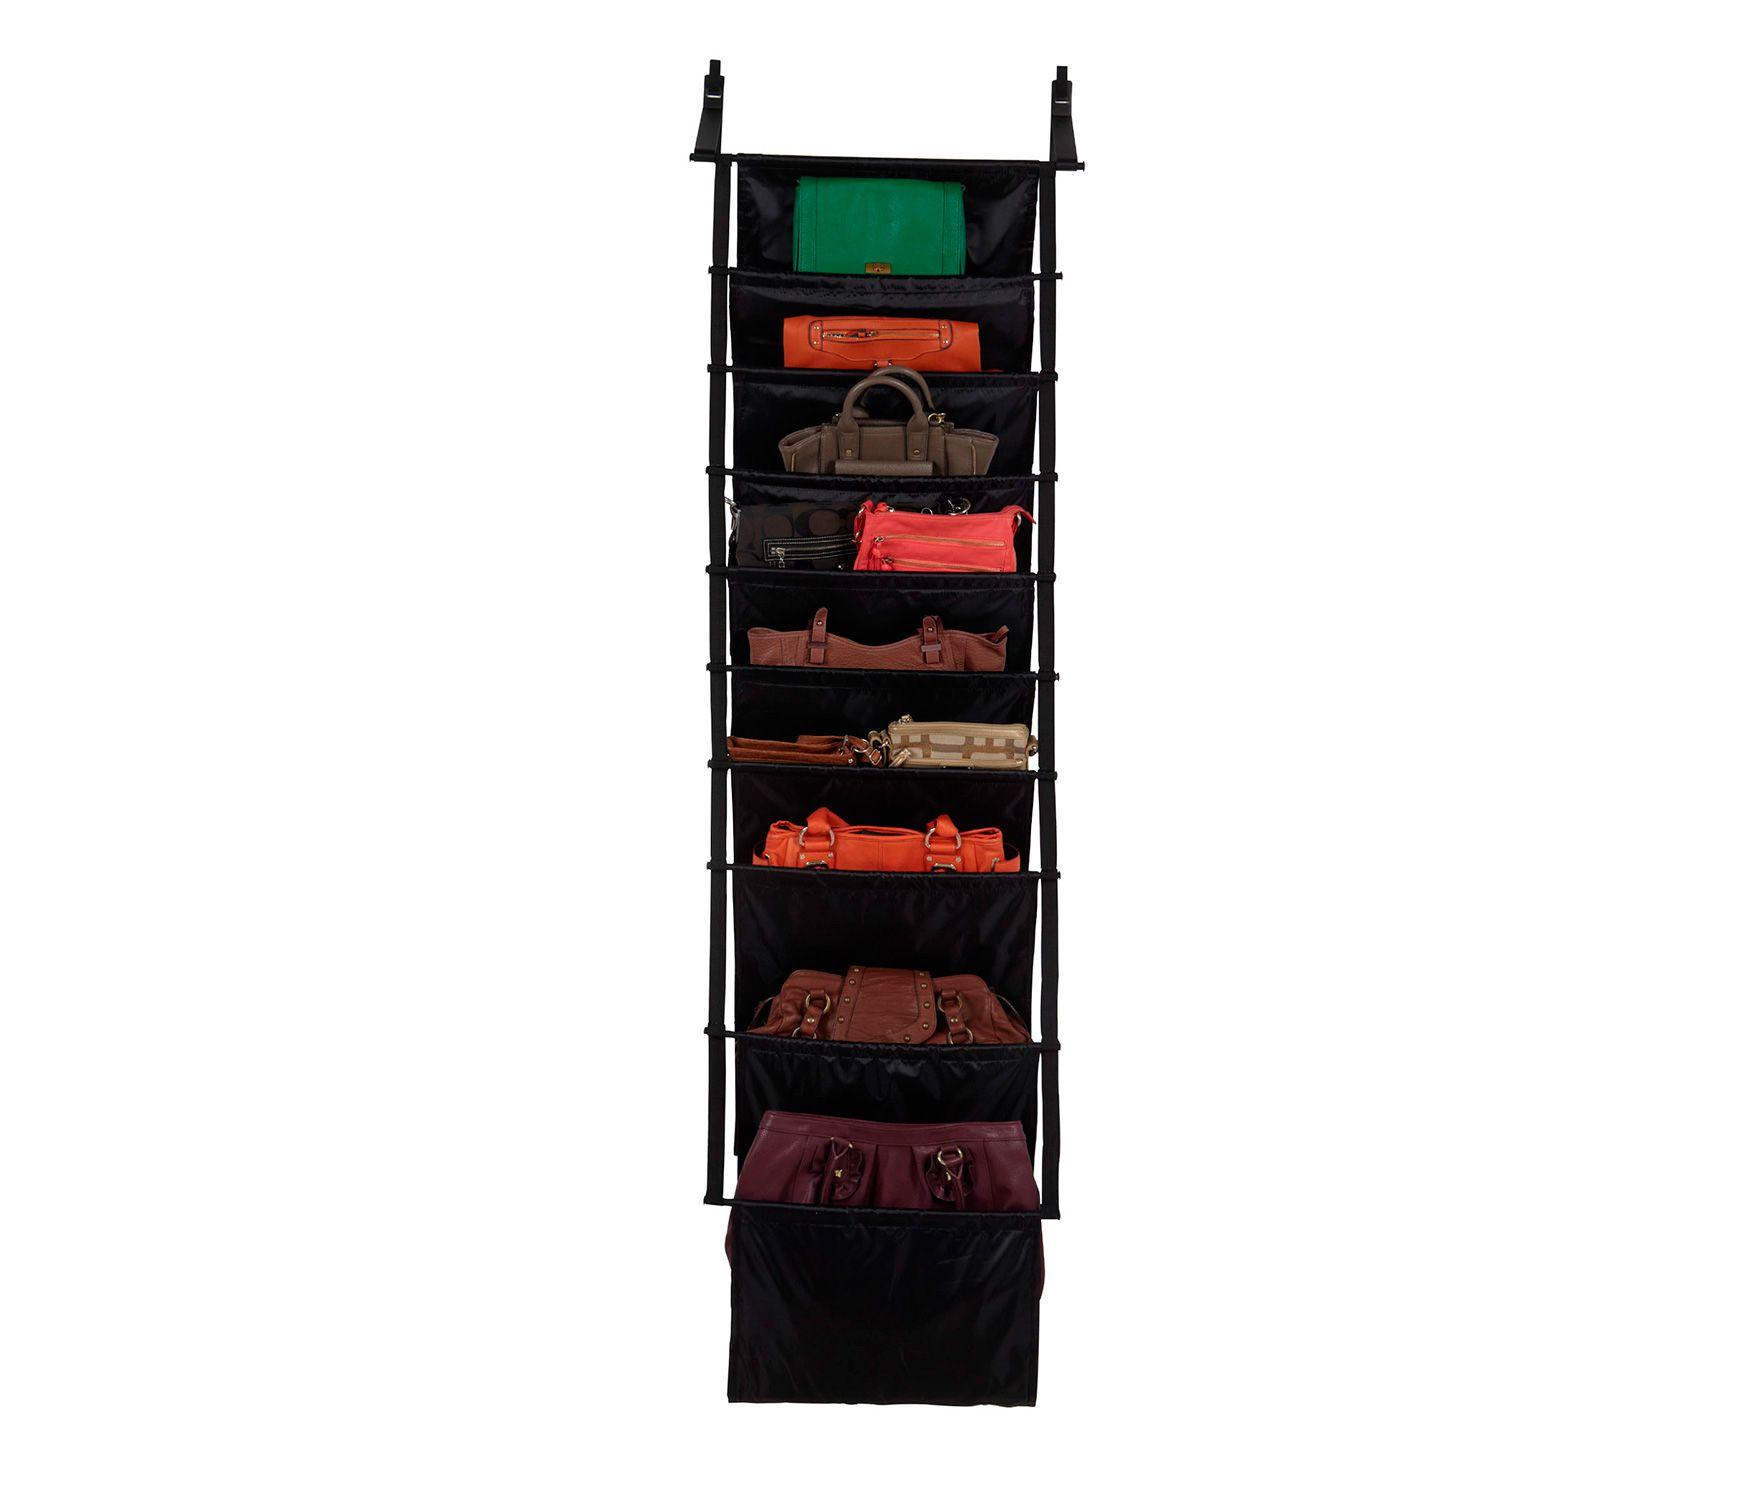 espejo alajero closet pinterest de organizador joyero pared pin bijoux